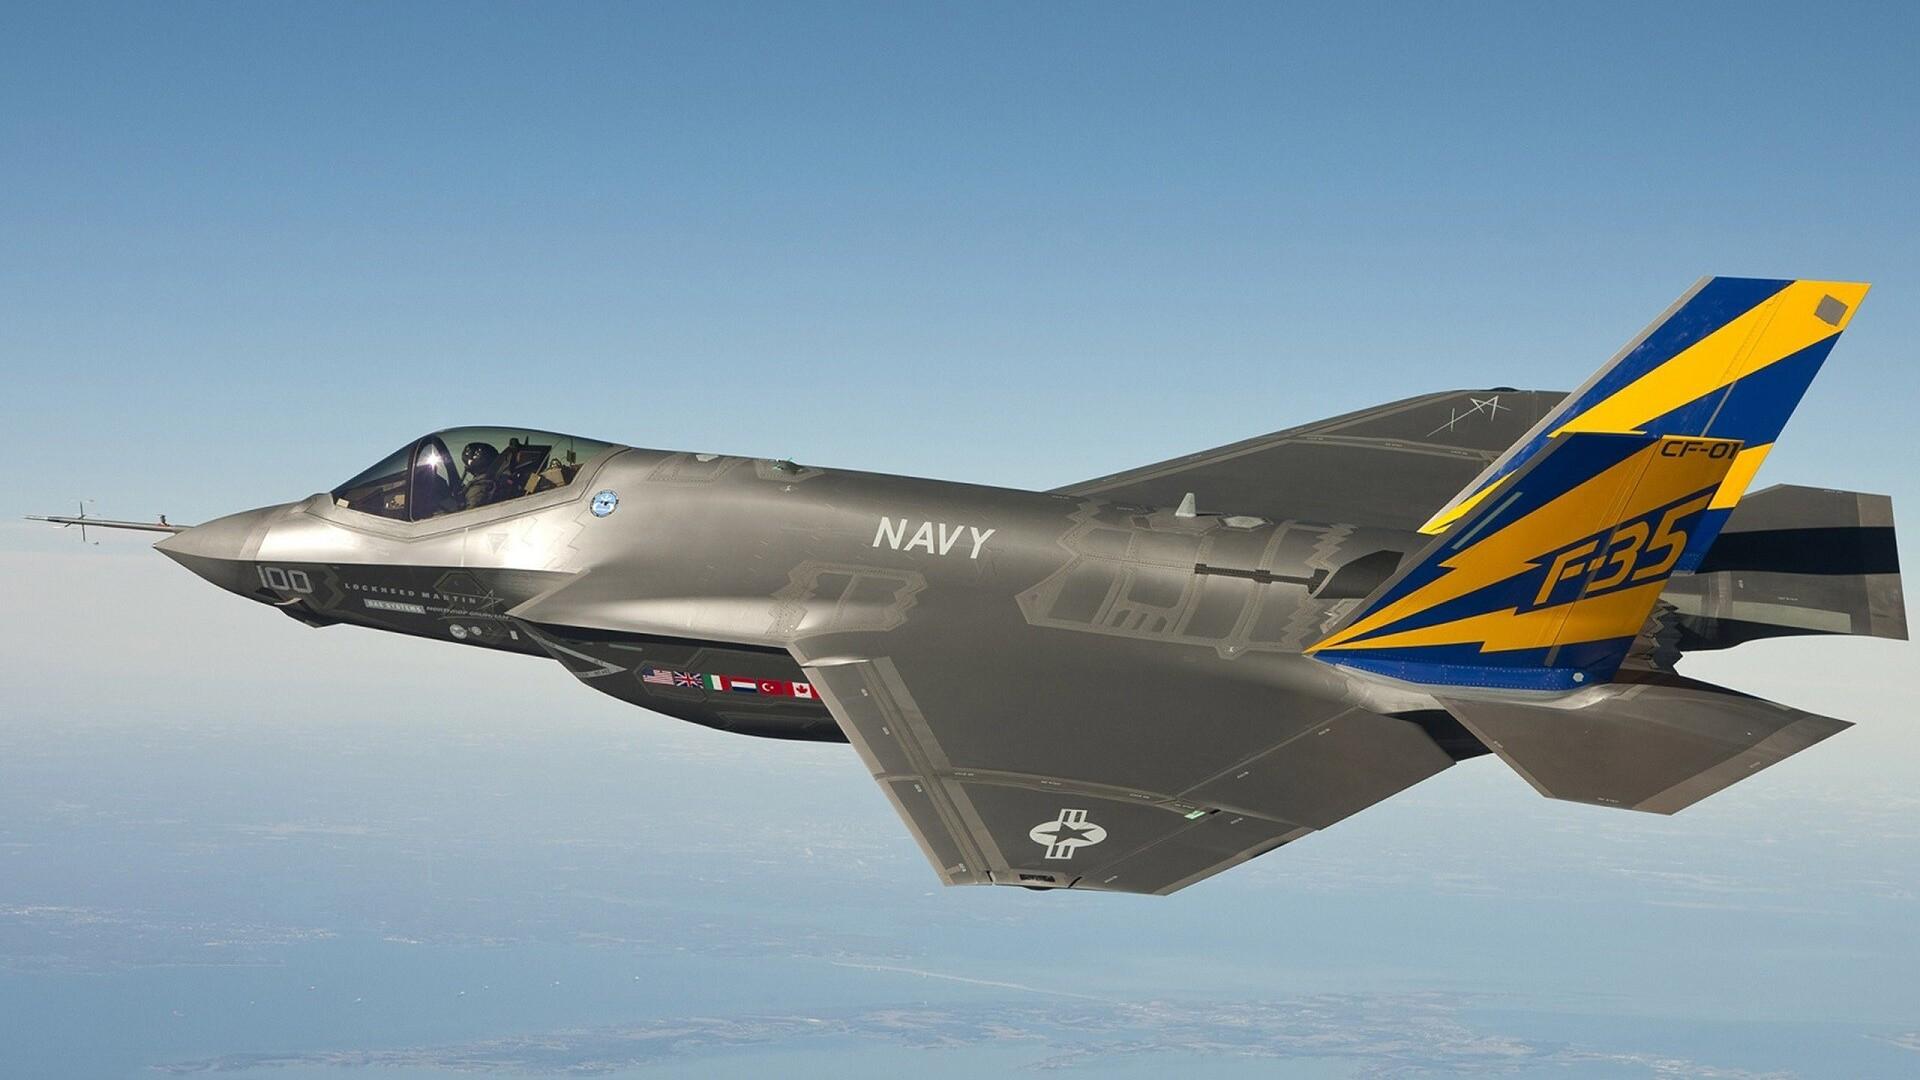 navy-f35-4k.jpg